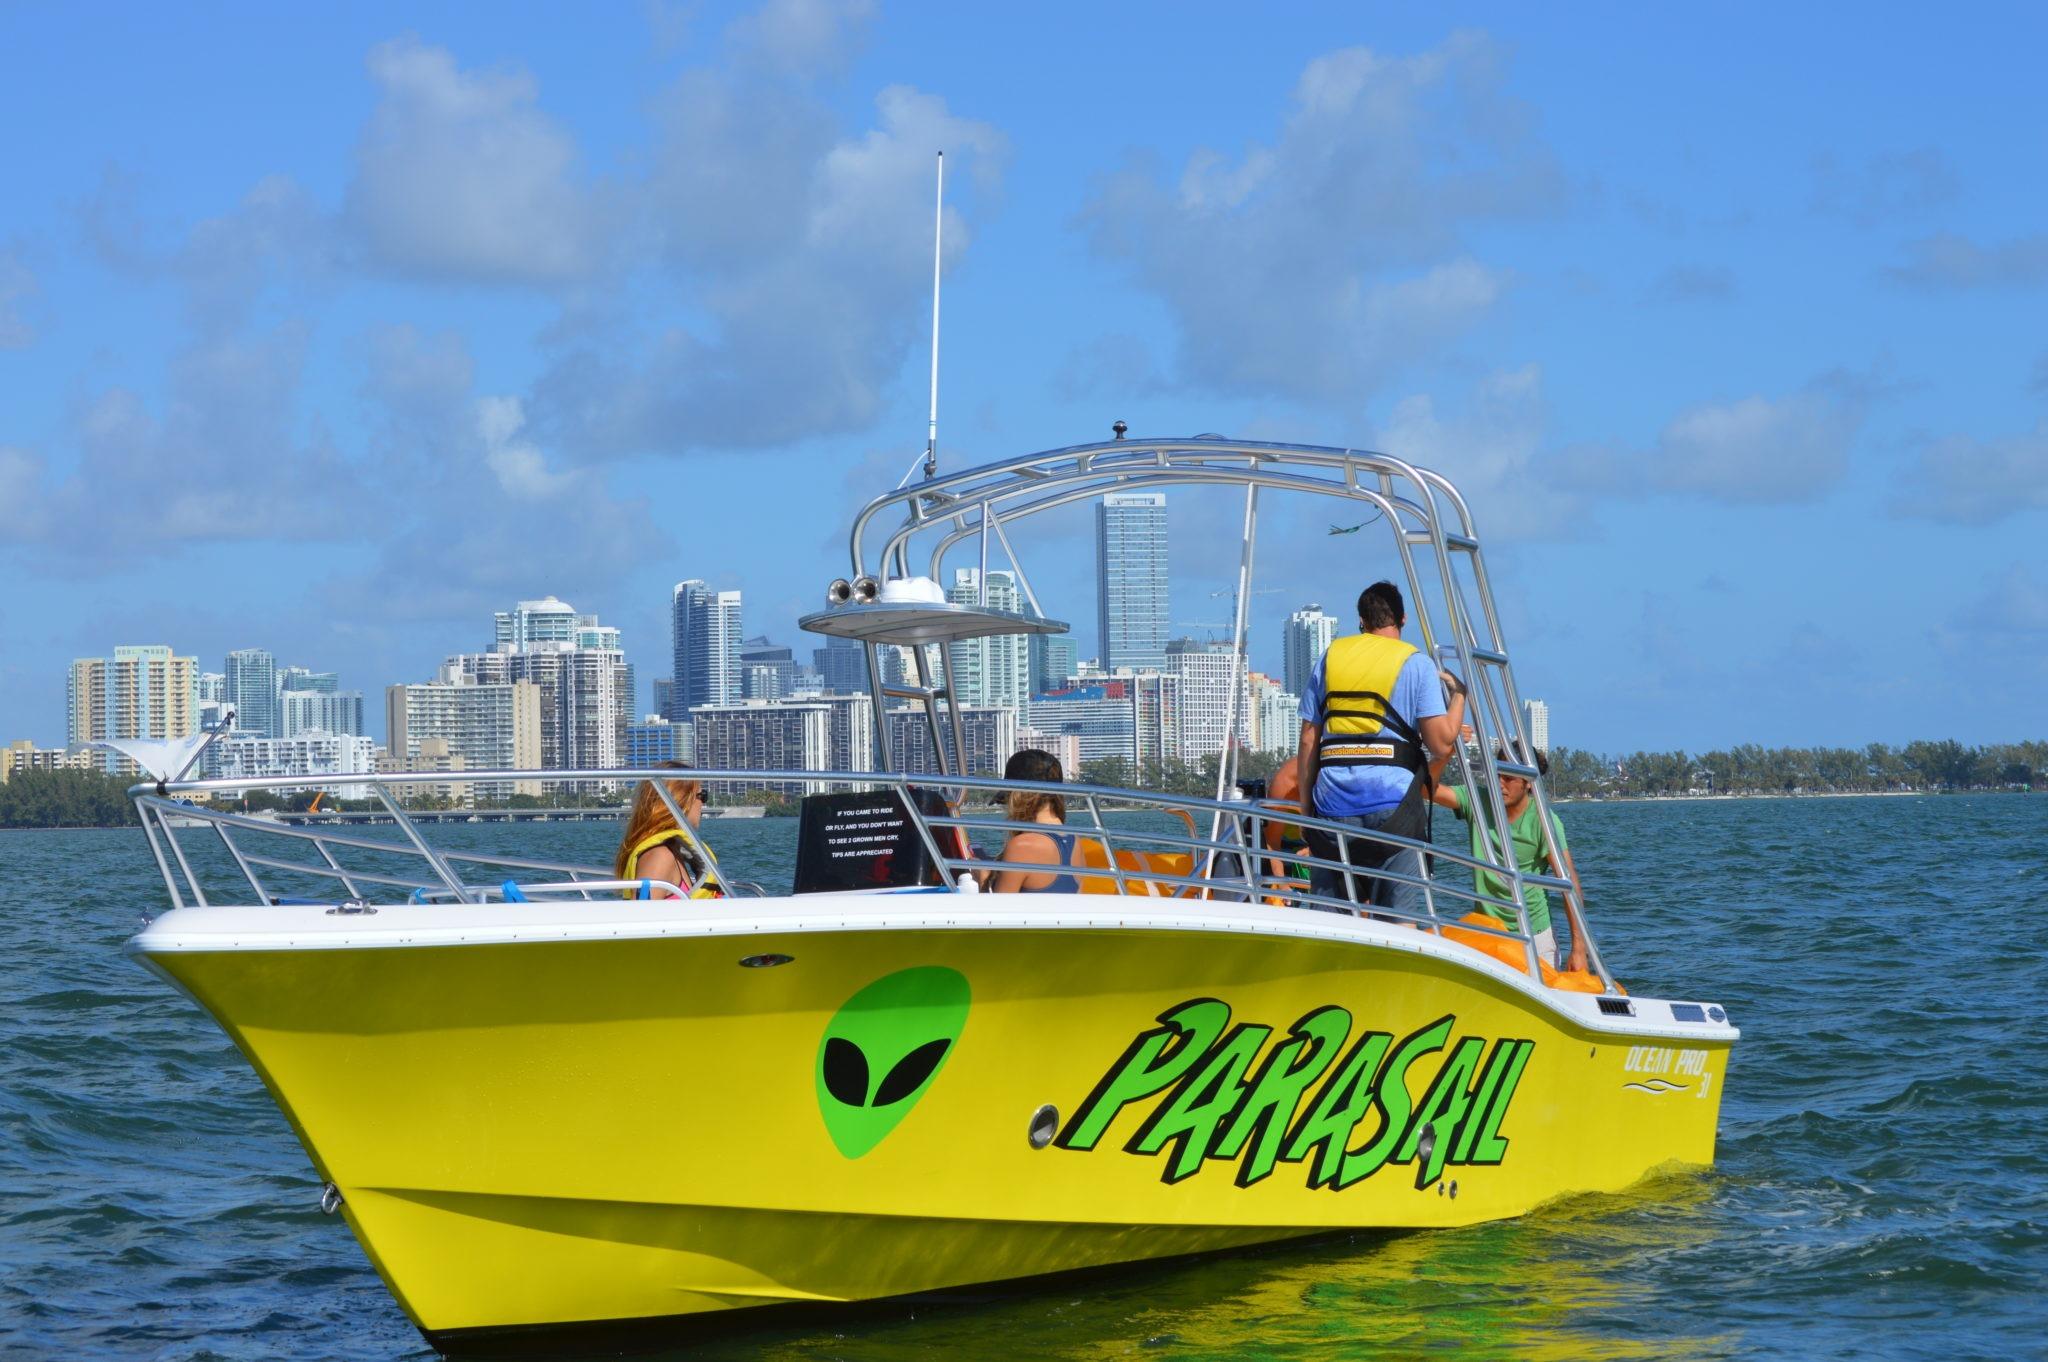 Miami Parasail Boat idling in Marina